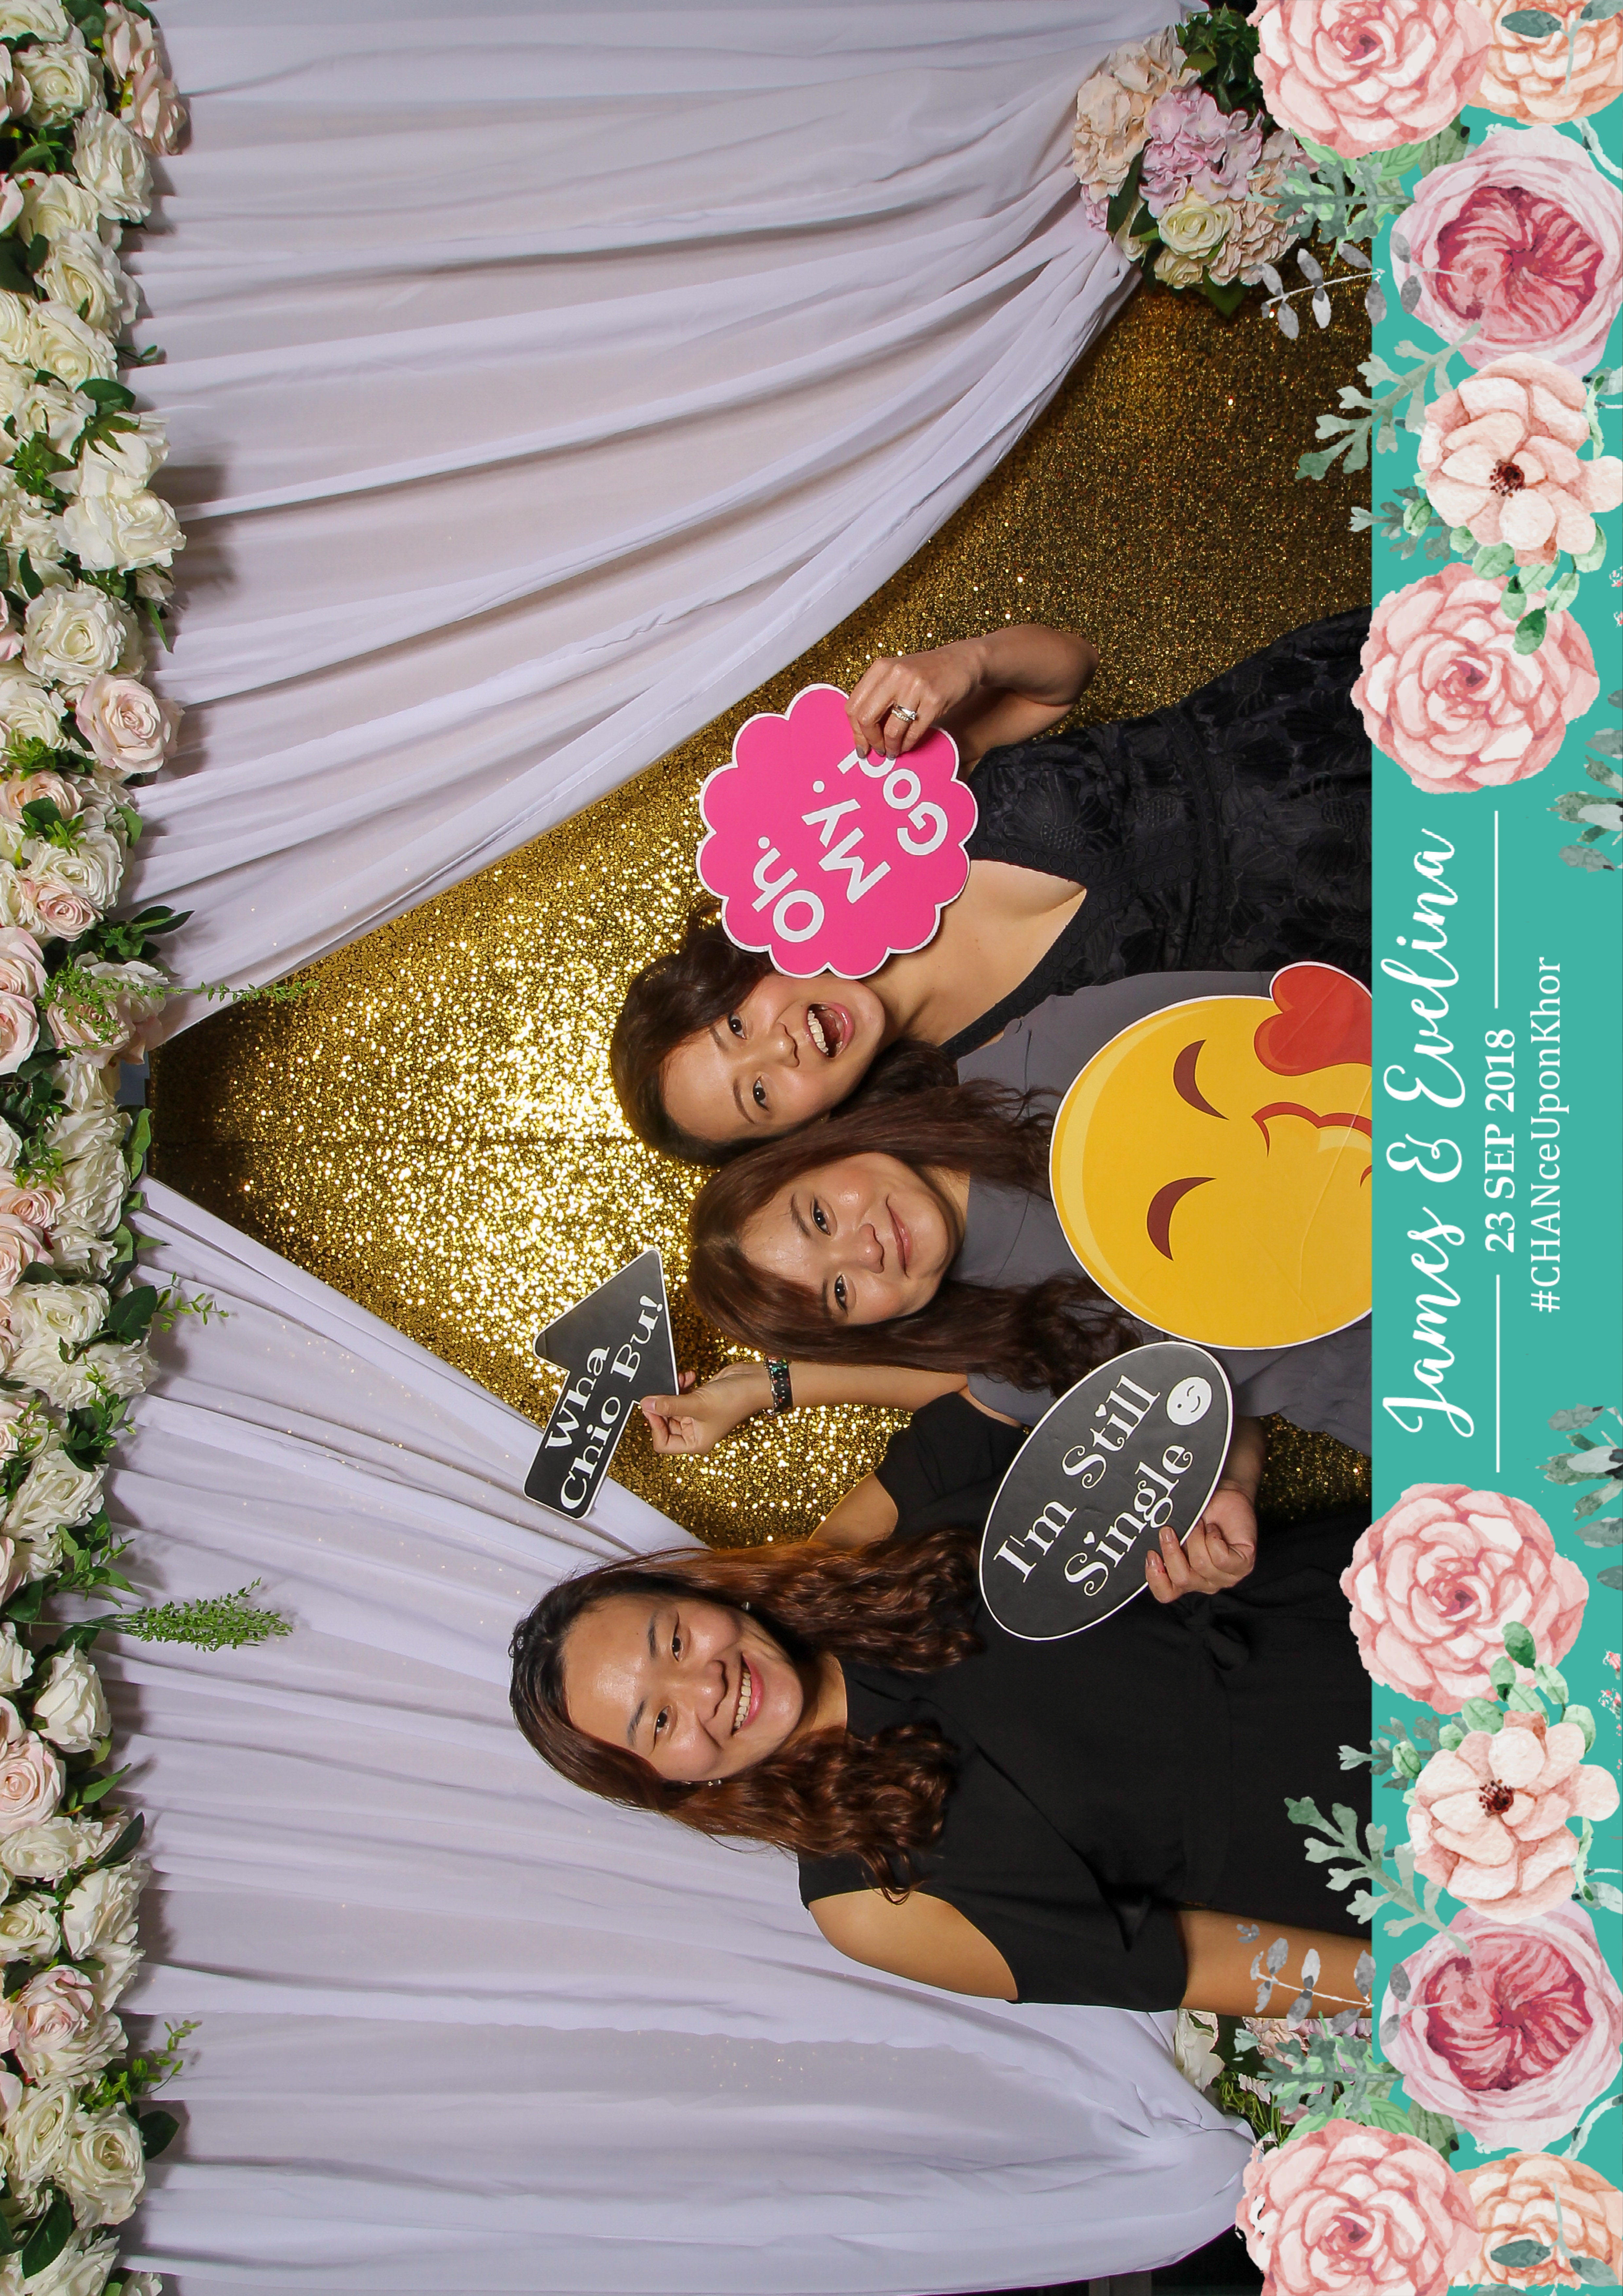 wedding photo booth singapore-22